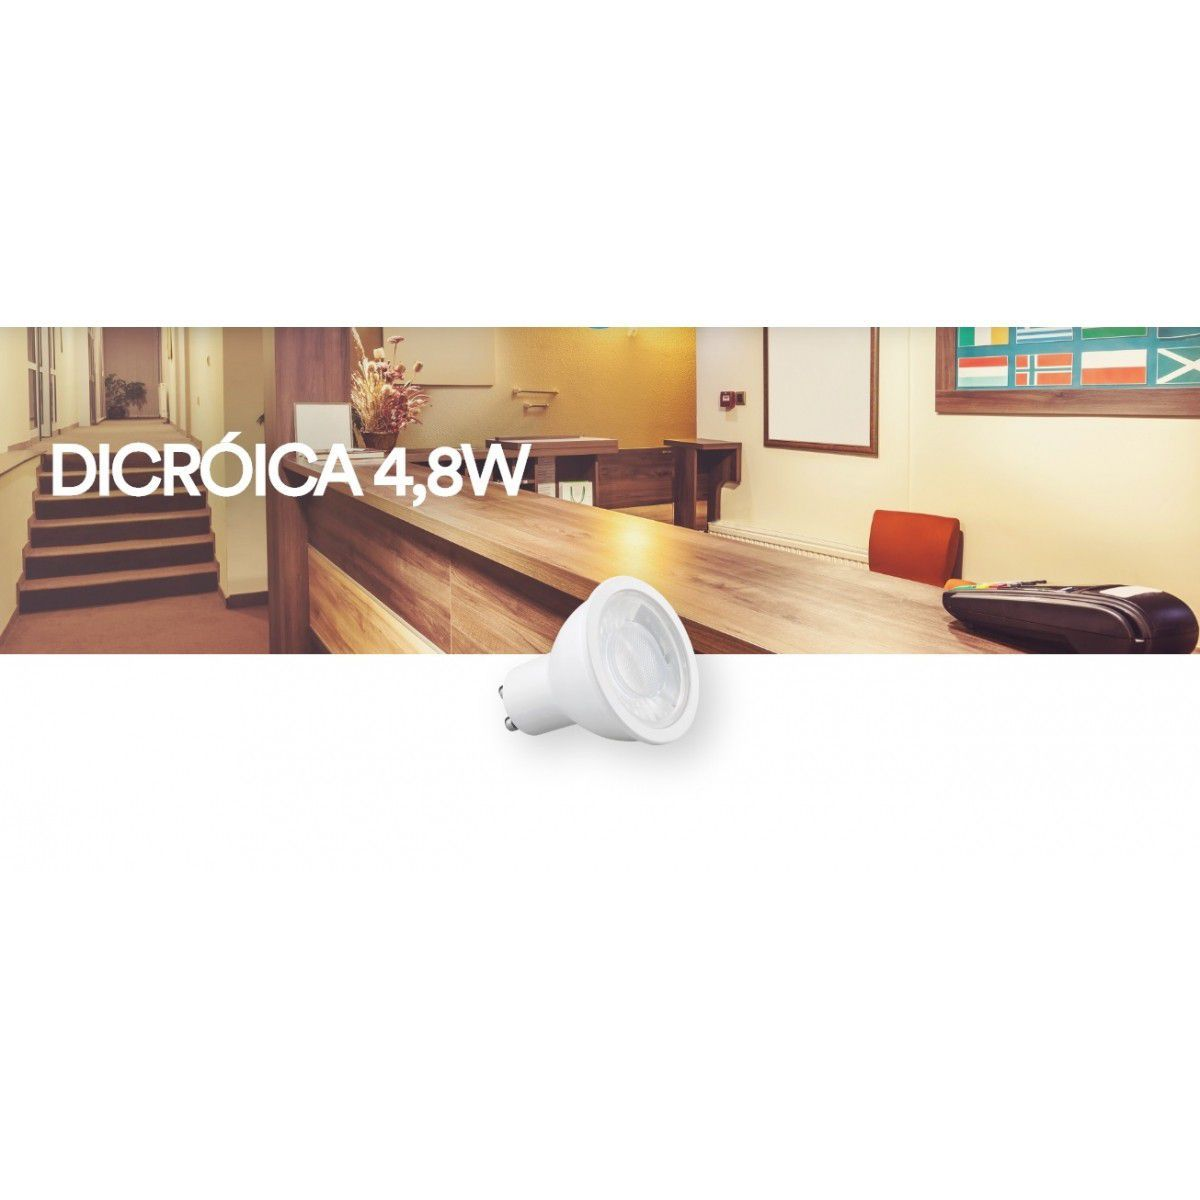 Lampada LED 4.8w 6500K Dicroica GU10 Save Energy SE 130.1100  - OUTLED ILUMINAÇÃO